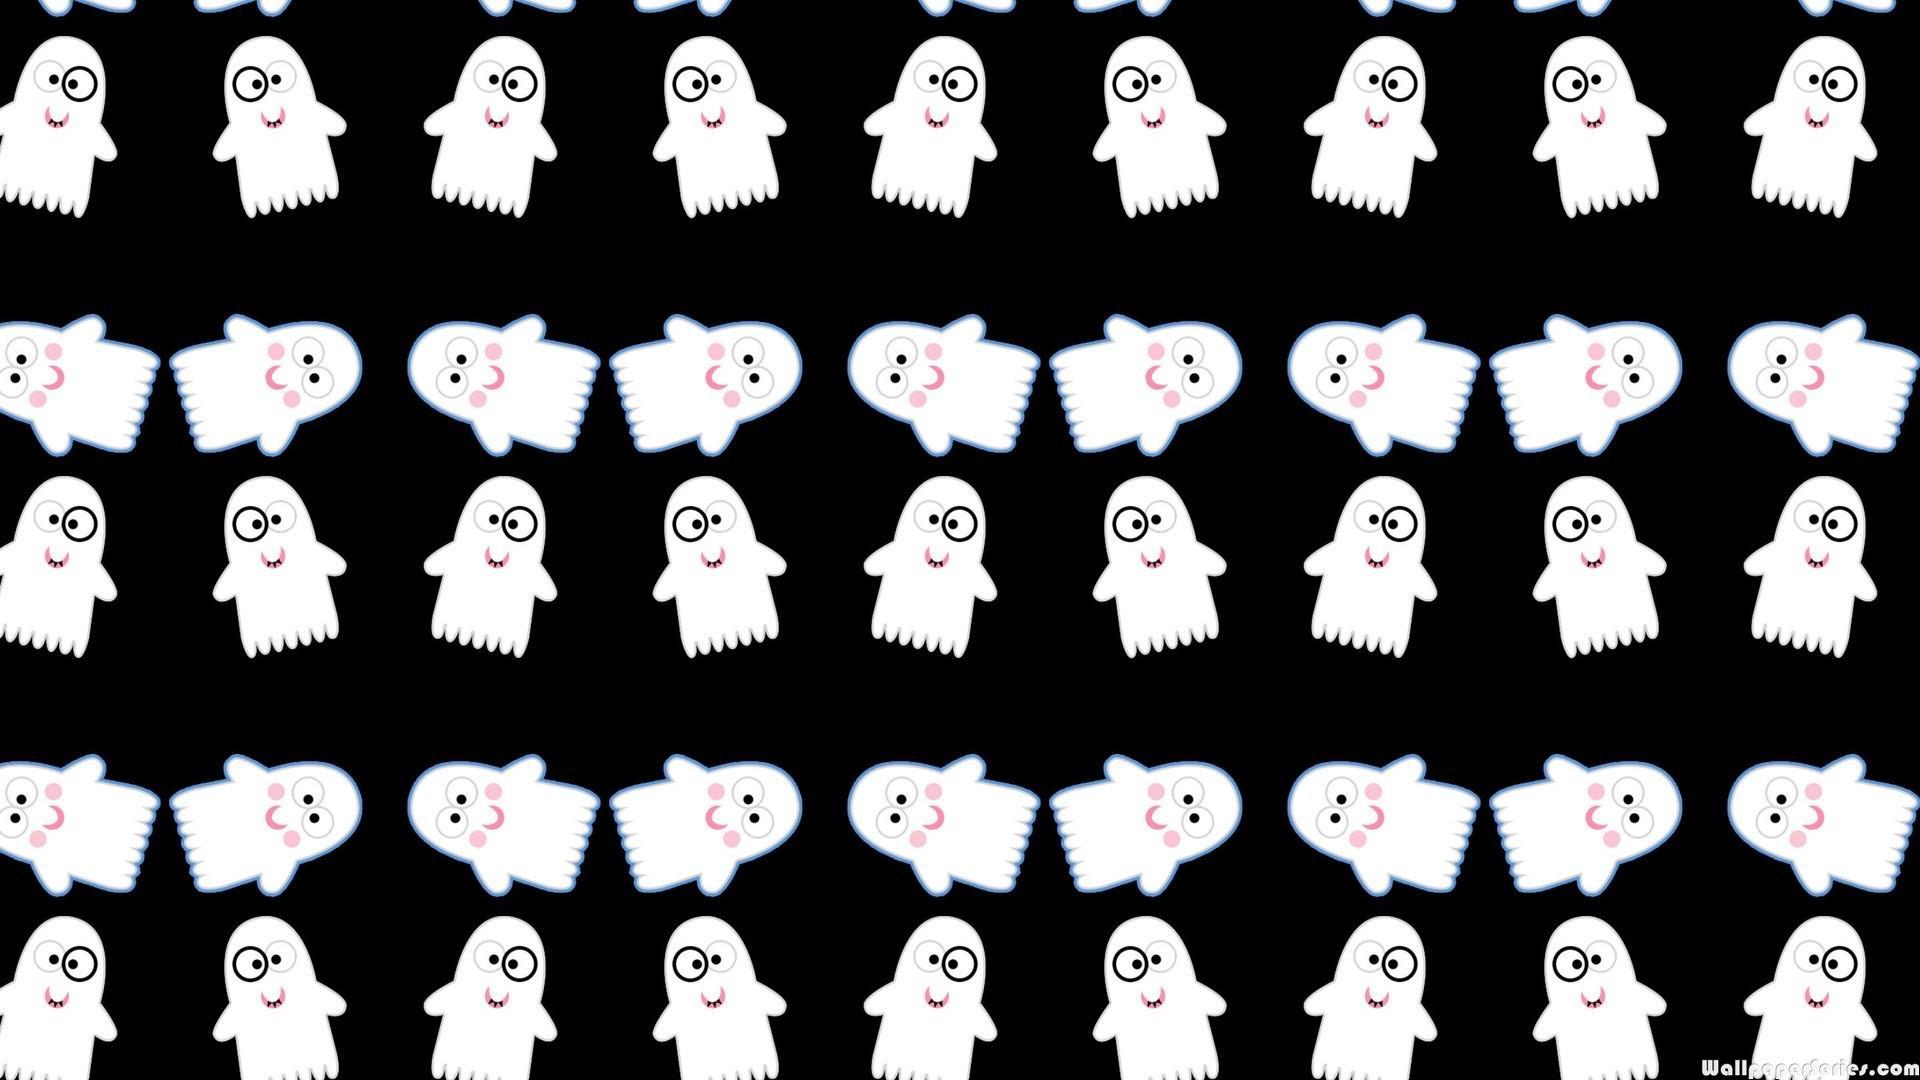 Ghost Data Girls Love Wallpaper Hd Cute Funny Ghost Pattern Wallpaper Download Free 139265